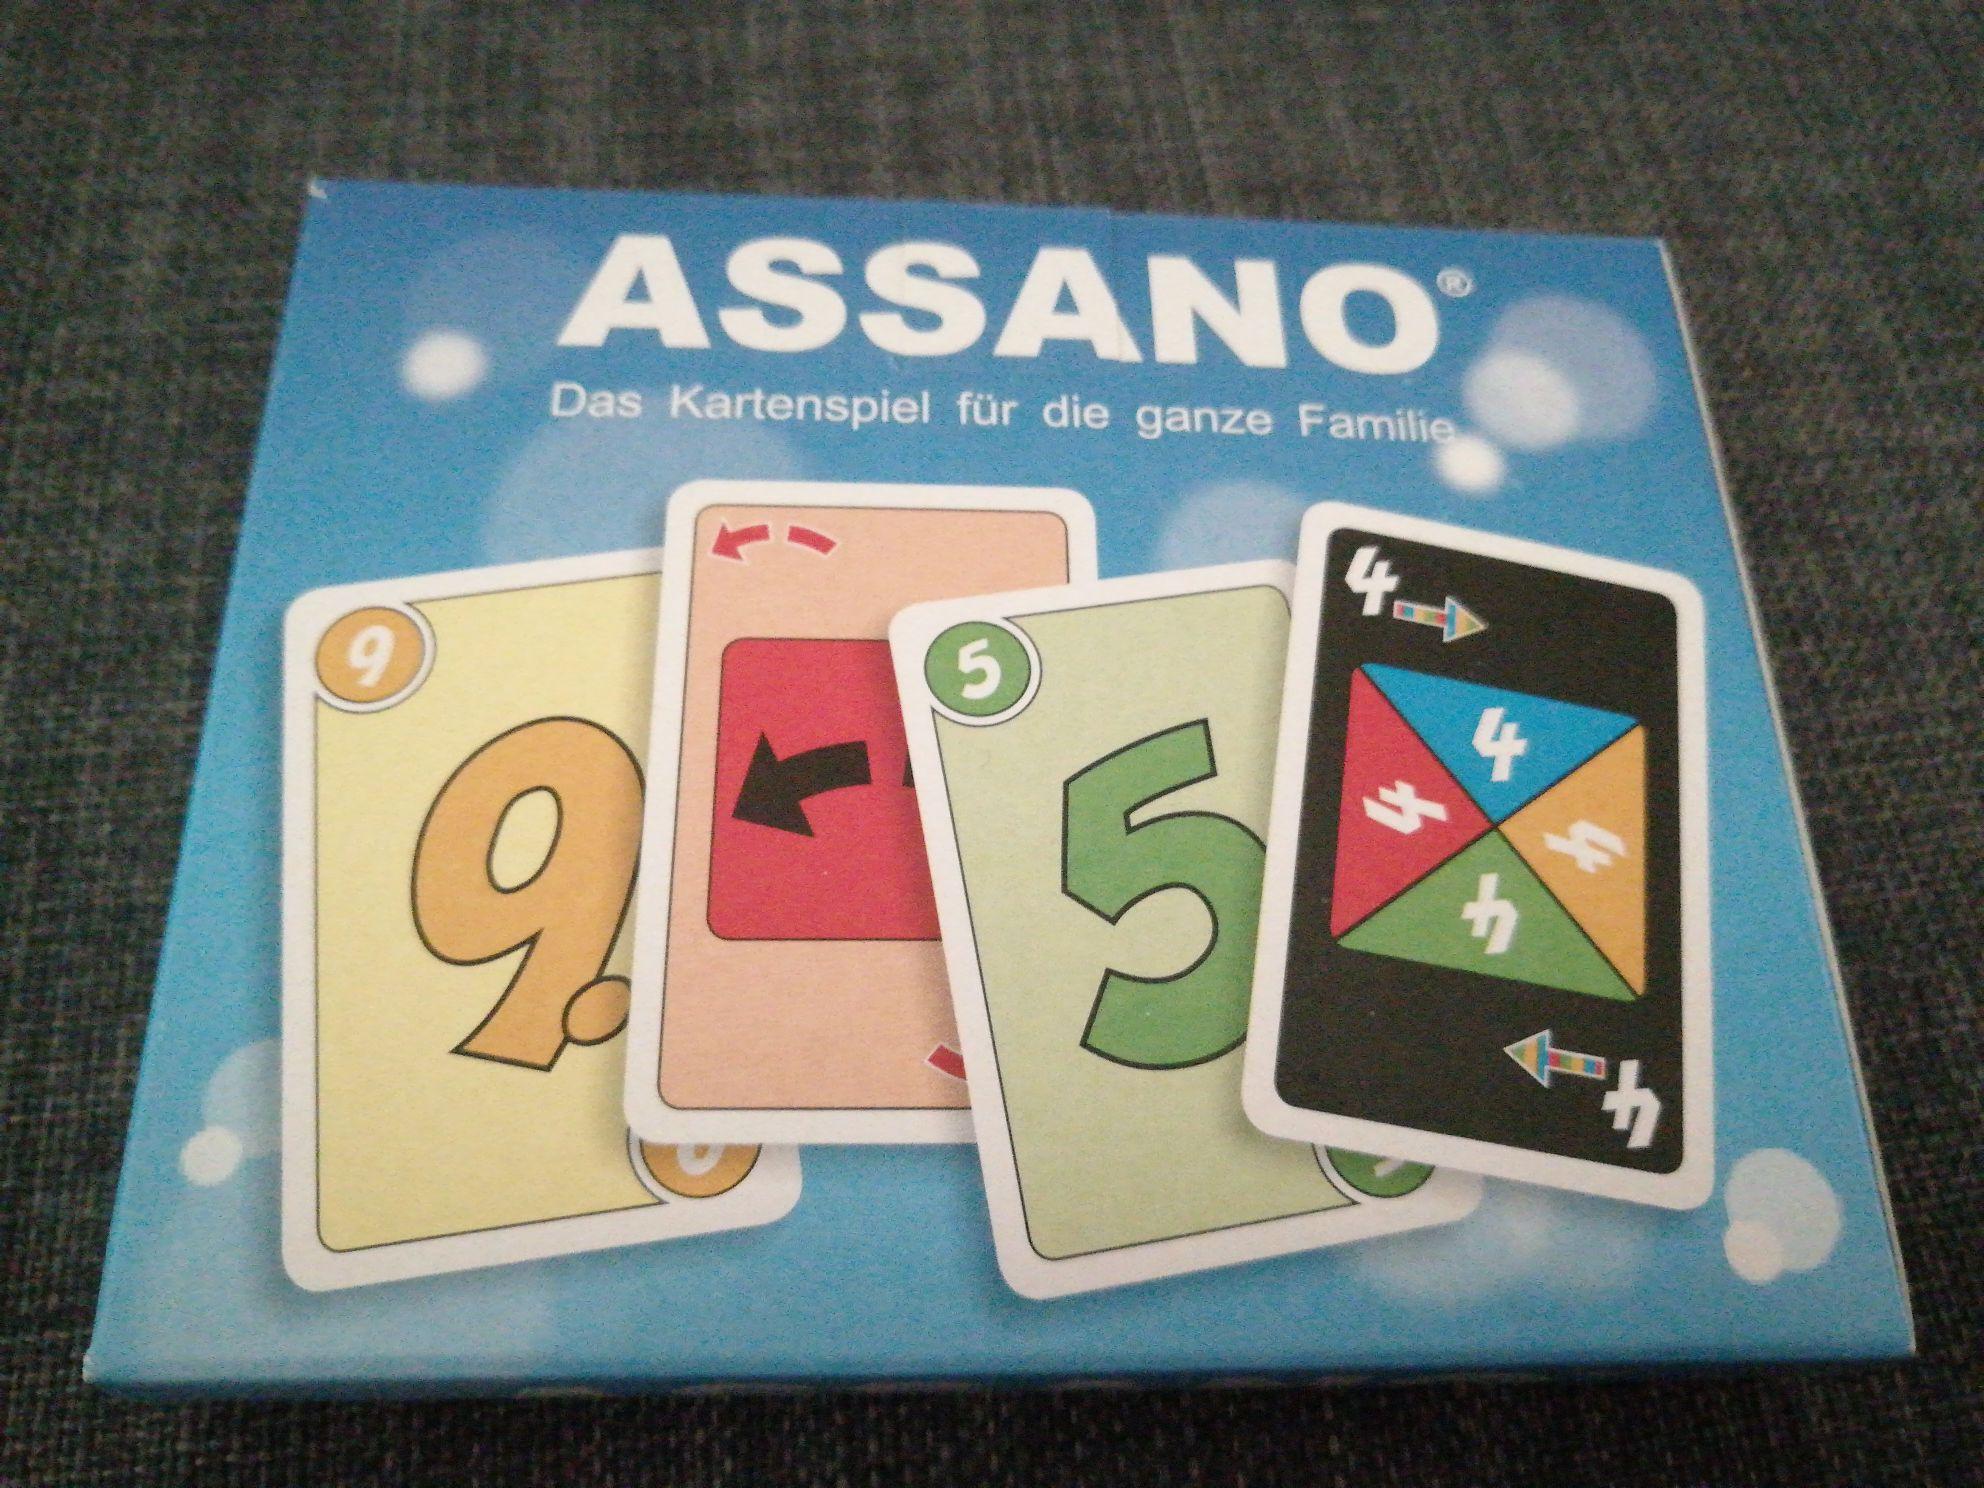 ASSANO alias UNO 1€ - [EuroShop]